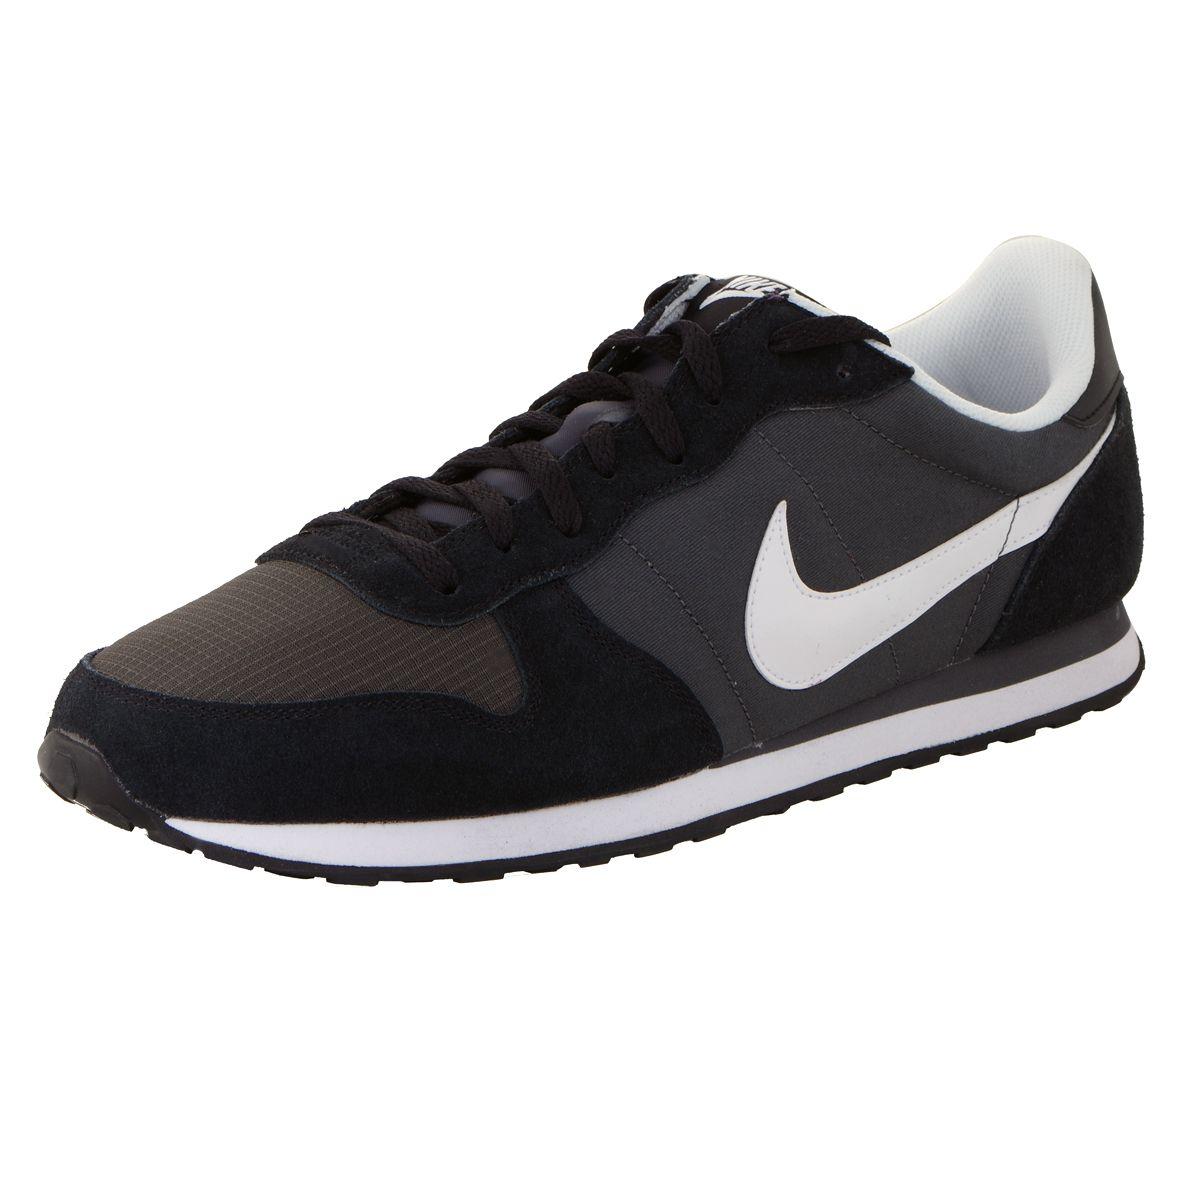 chaussures nike genicco grises grande taille du 47 5 au. Black Bedroom Furniture Sets. Home Design Ideas